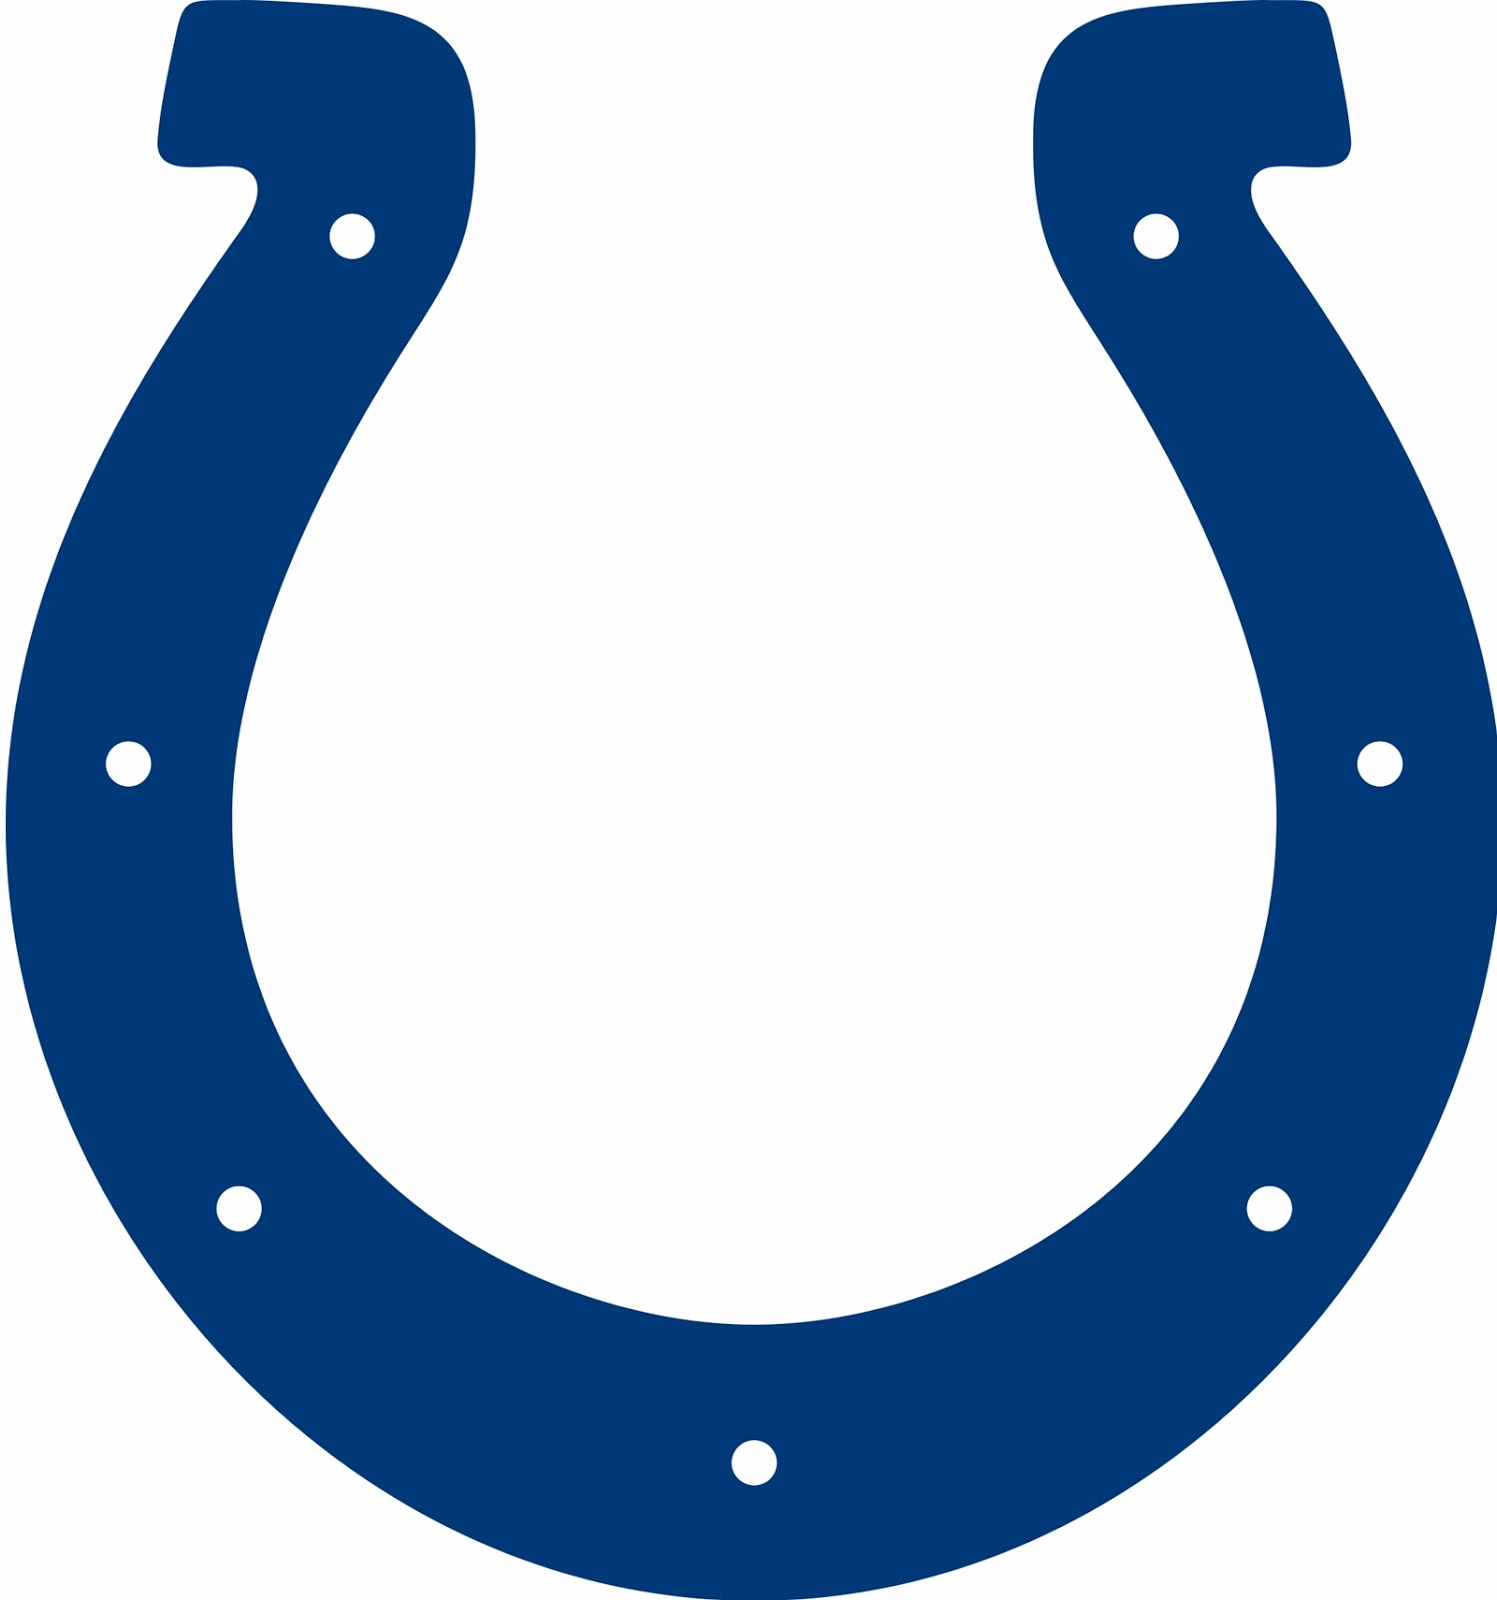 colts logo transparent indianapolis colts horseshoe images